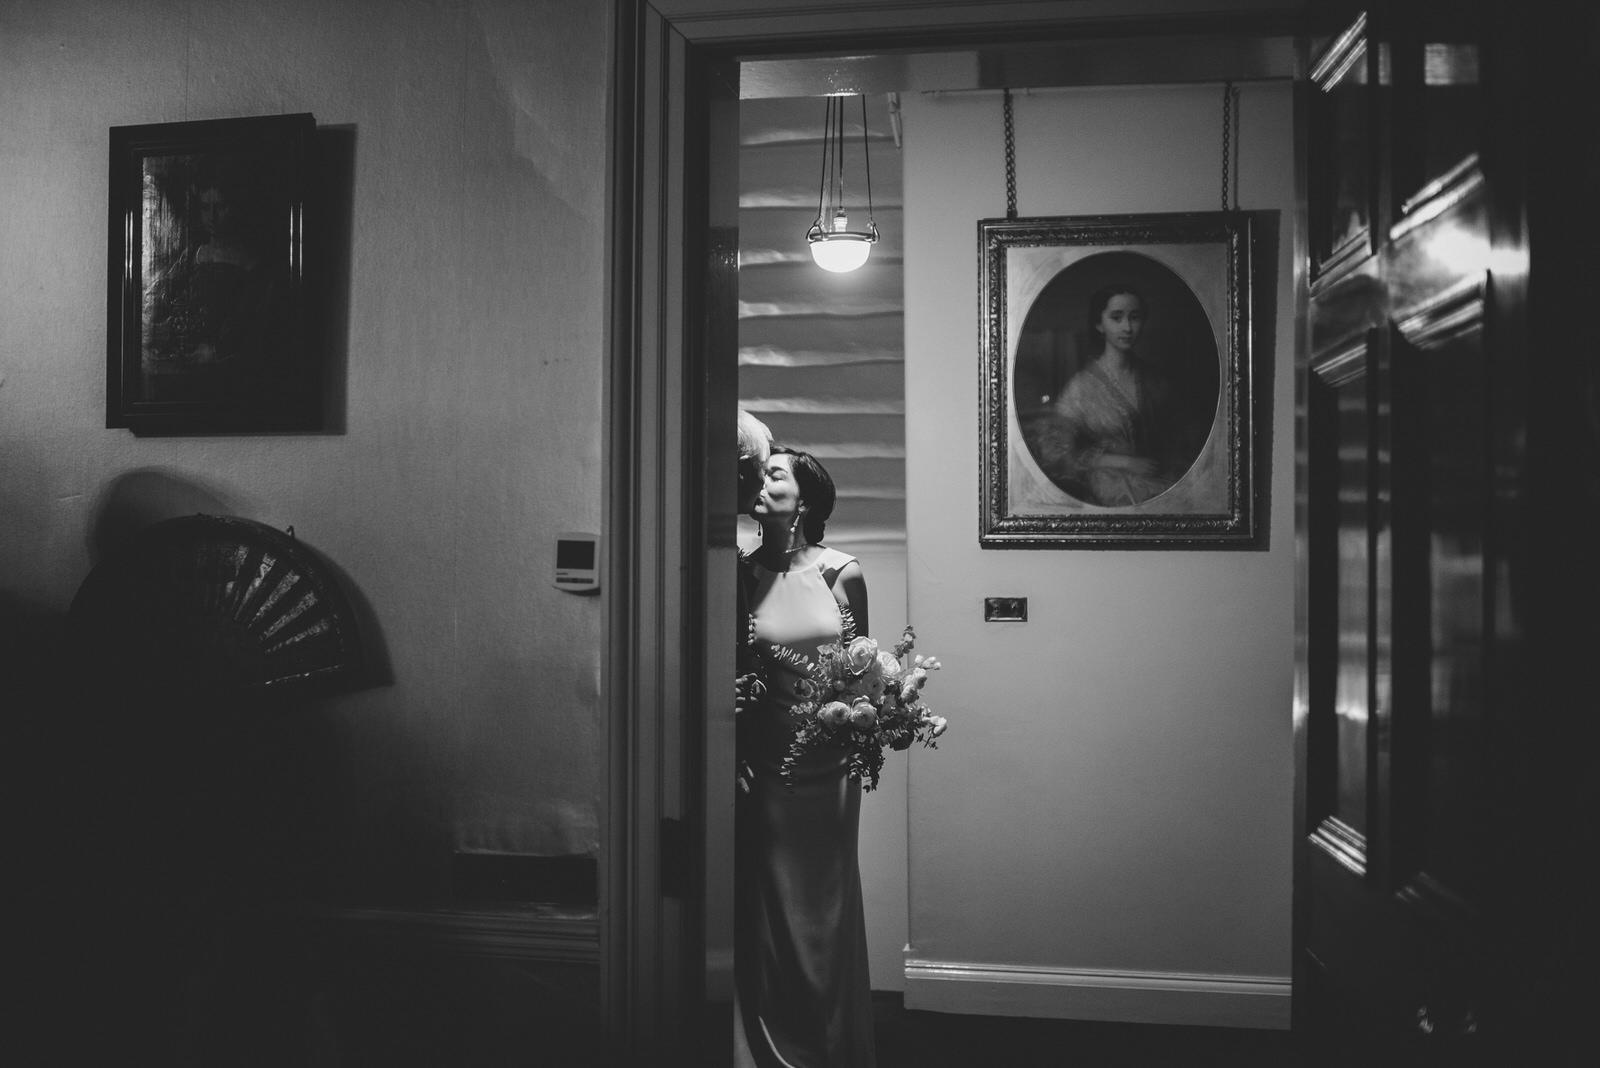 028-COLSTOUN-HOUSE-WEDDING-ALTERNATIVE-WEDDING-PHOTOGRAPHER-GLASGOW-WEDDING-PHOTOGRAPHER-STYLISH-SCOTTISH-WEDDING.JPG